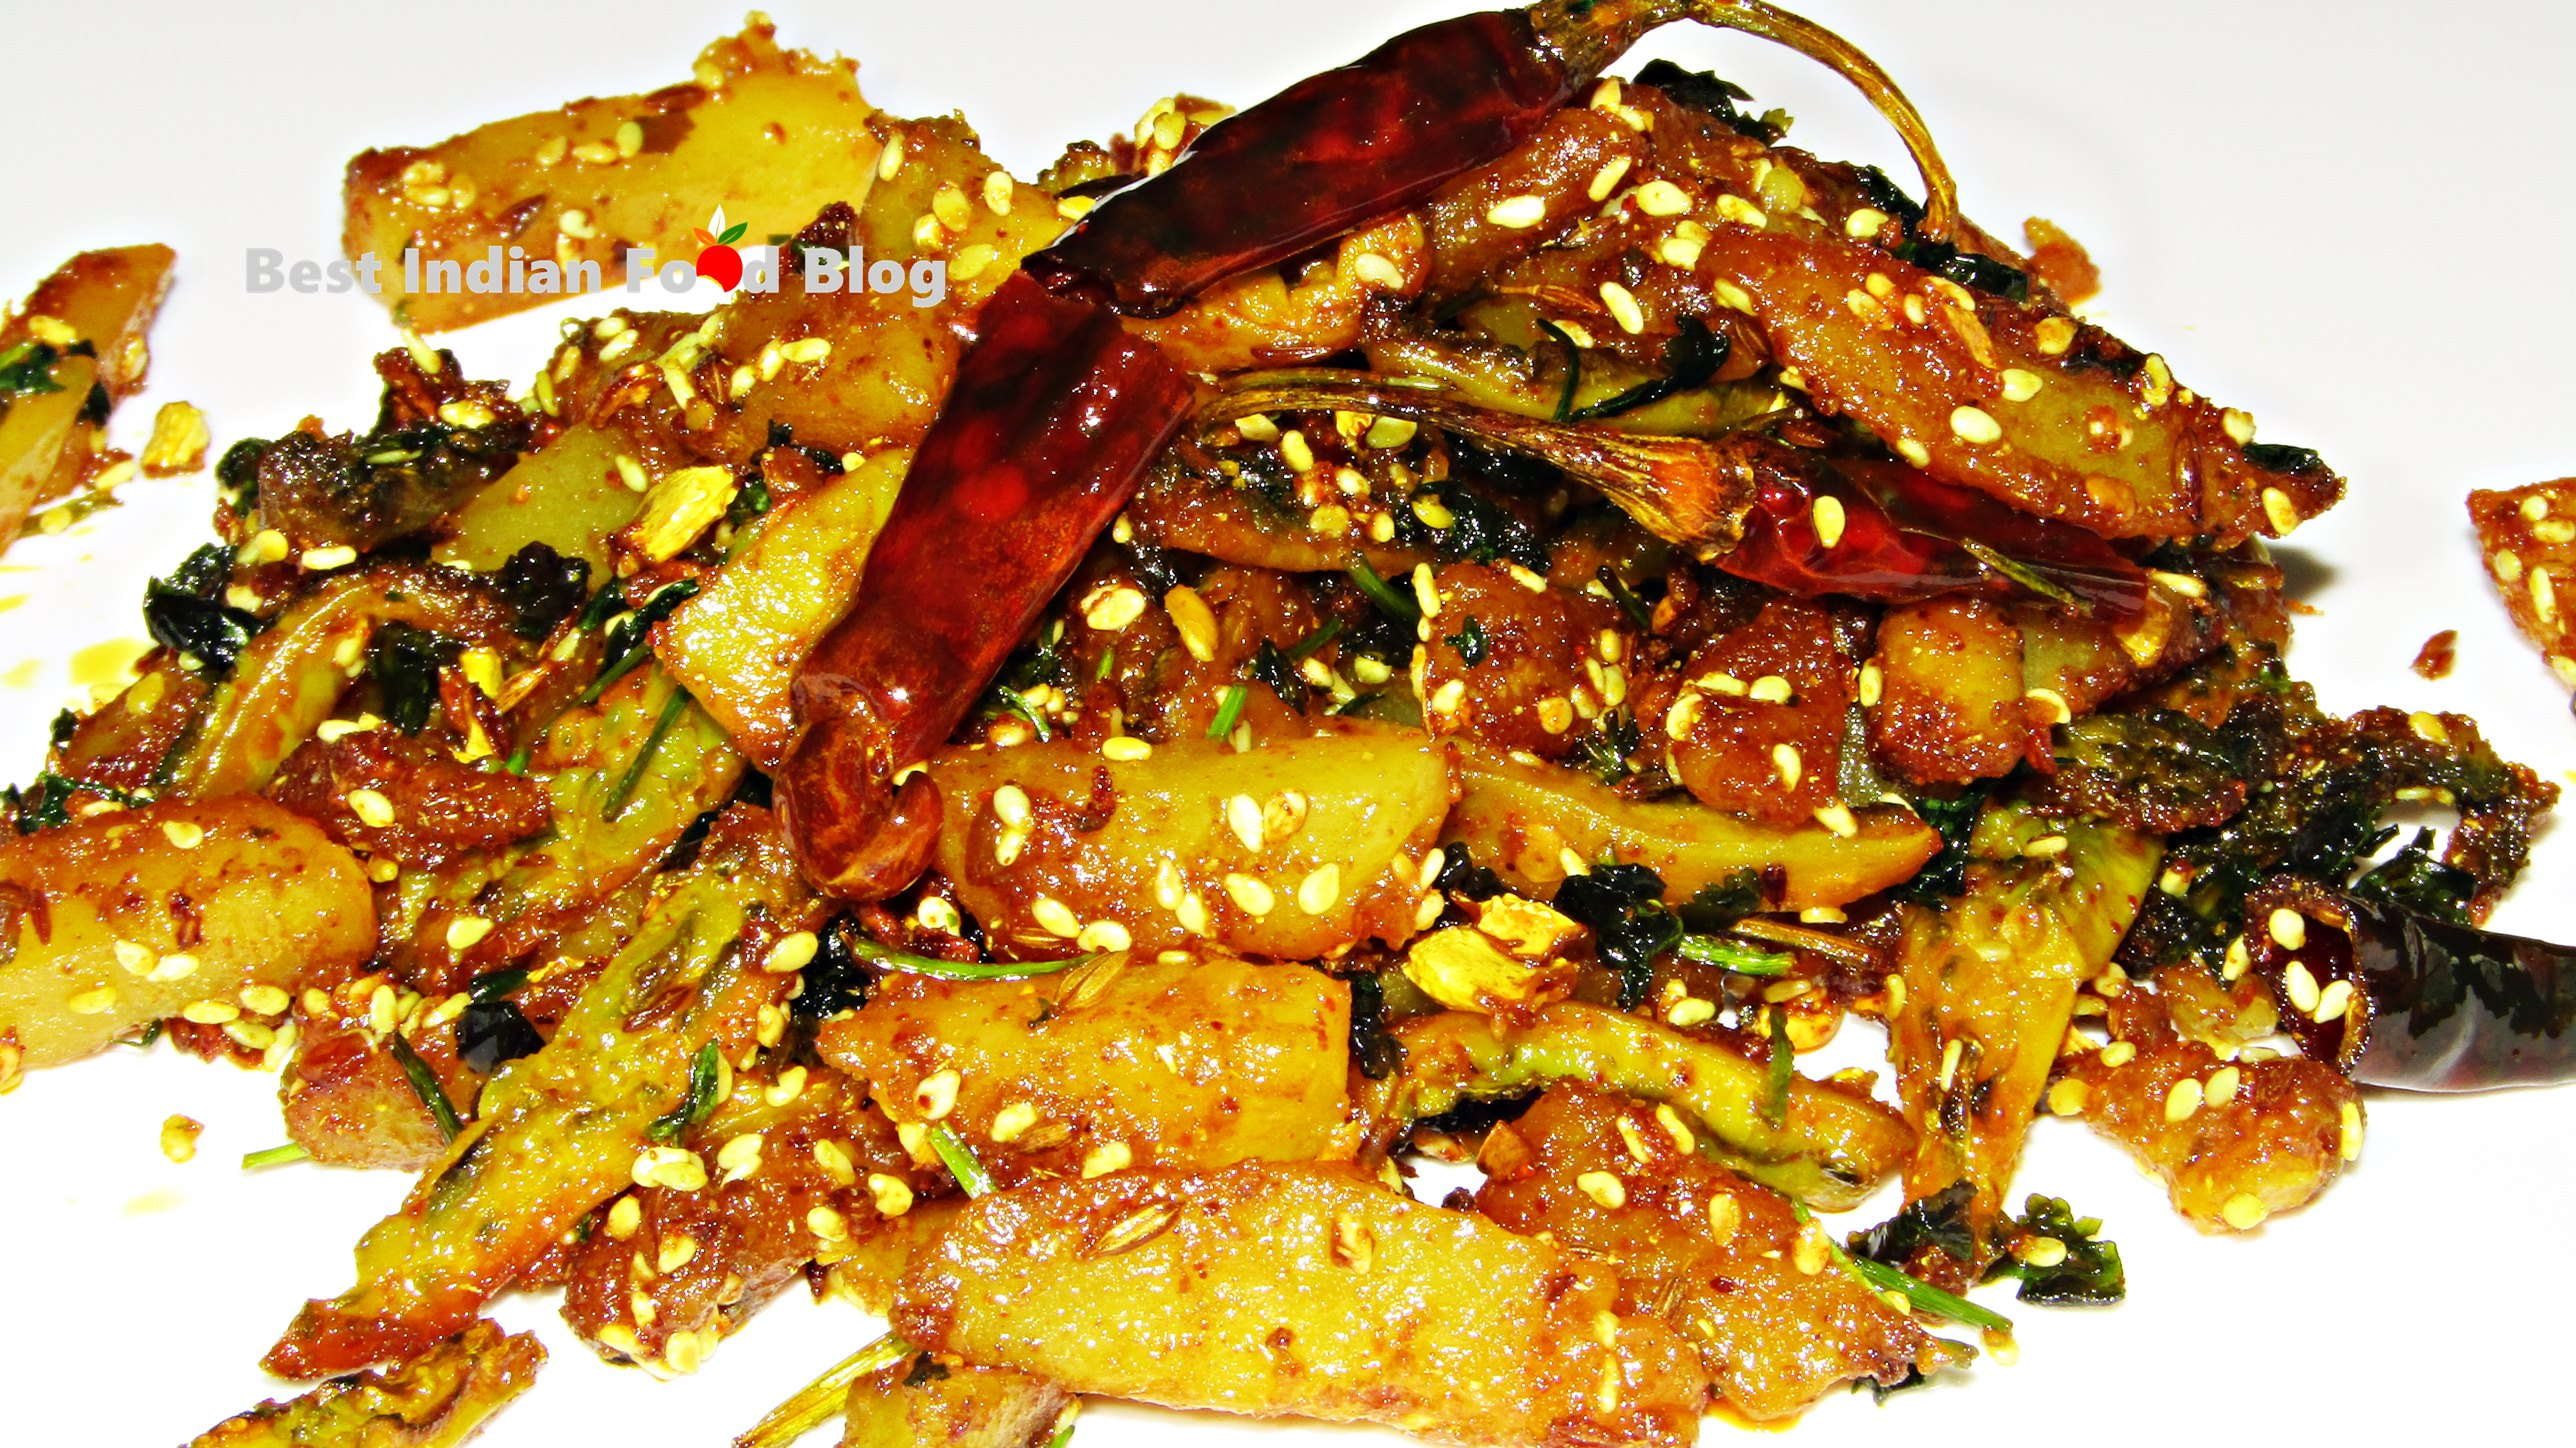 Karela Batata nu Shaak from Gujarat, India | Best Indian Food Blog